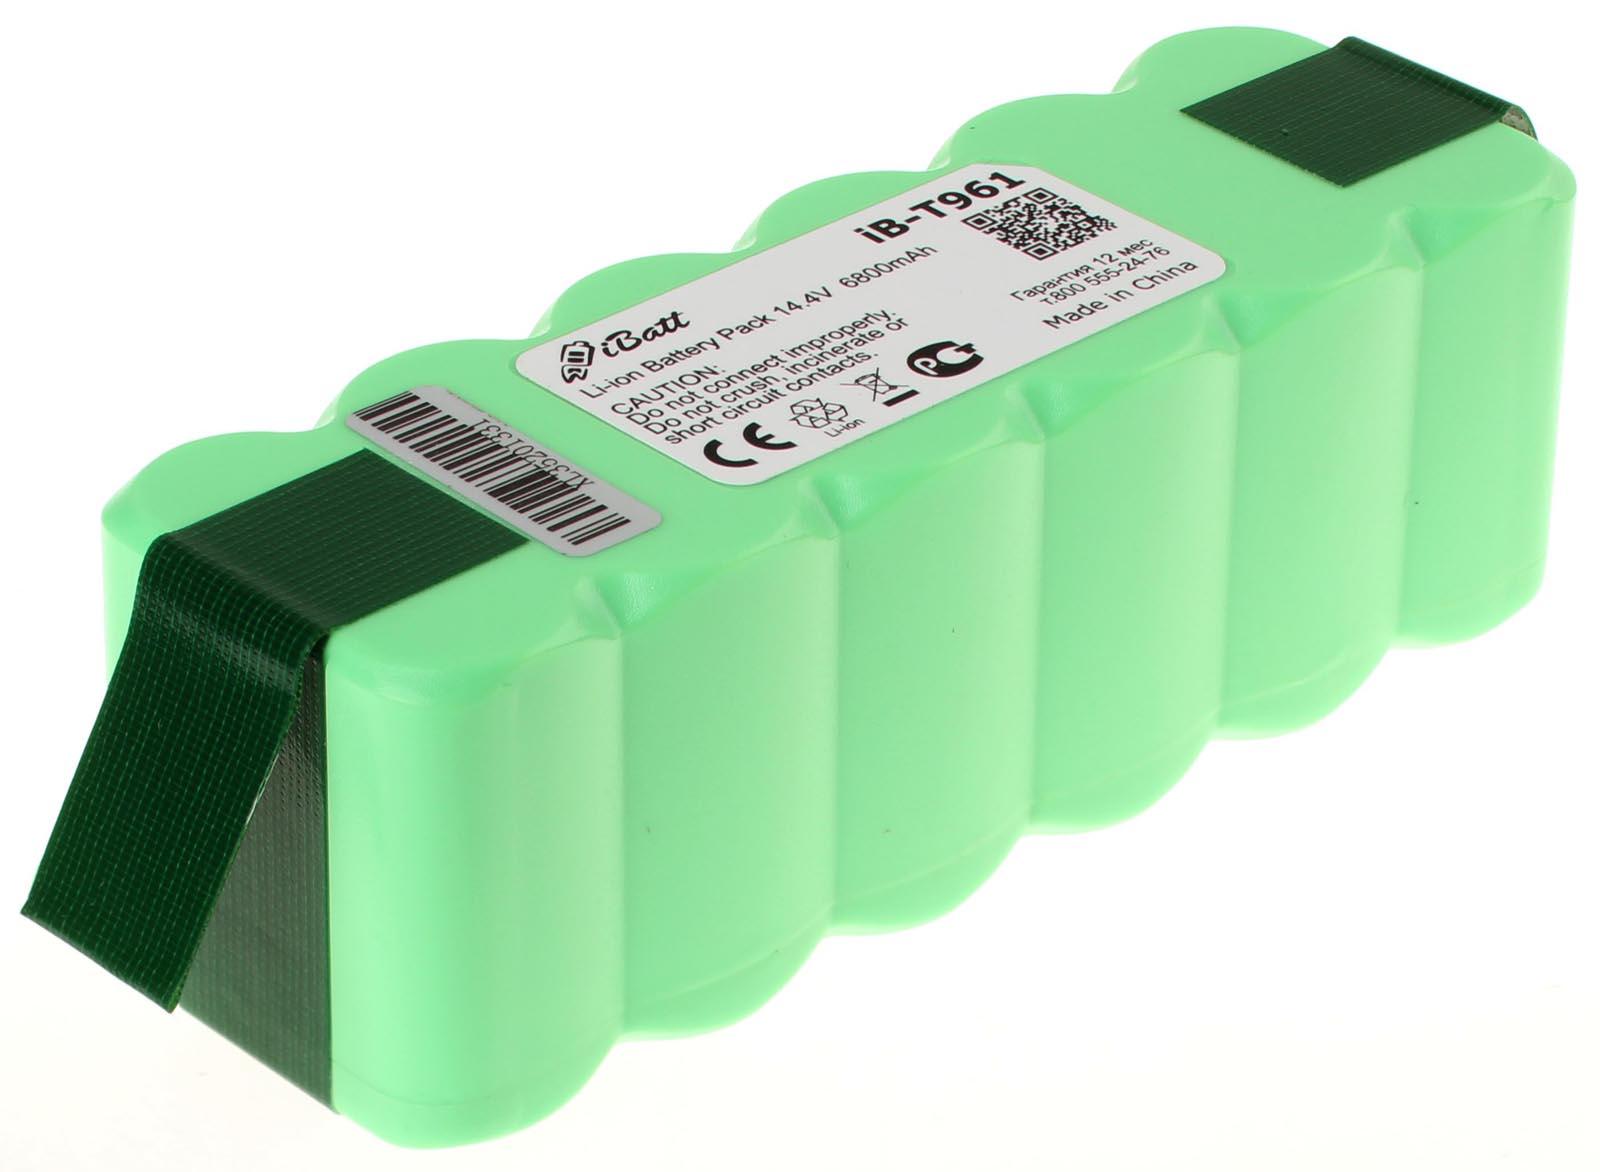 Купить аккумулятор (батарею) для пылесоса iRobot Roomba 650. Артикул iB-T961